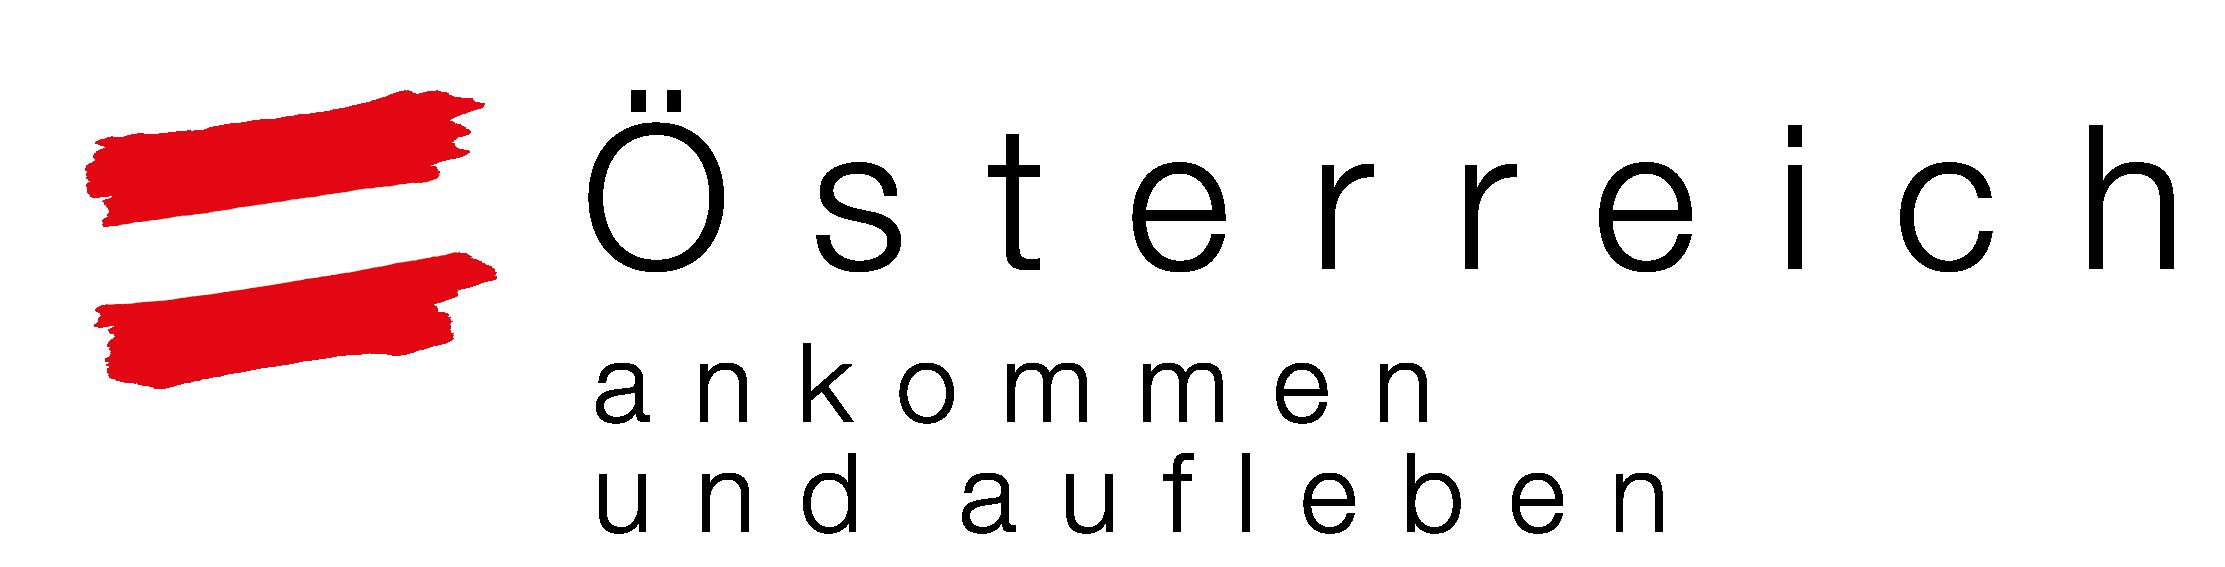 oew_logo-b2c_de, Österreich Werbung Logo